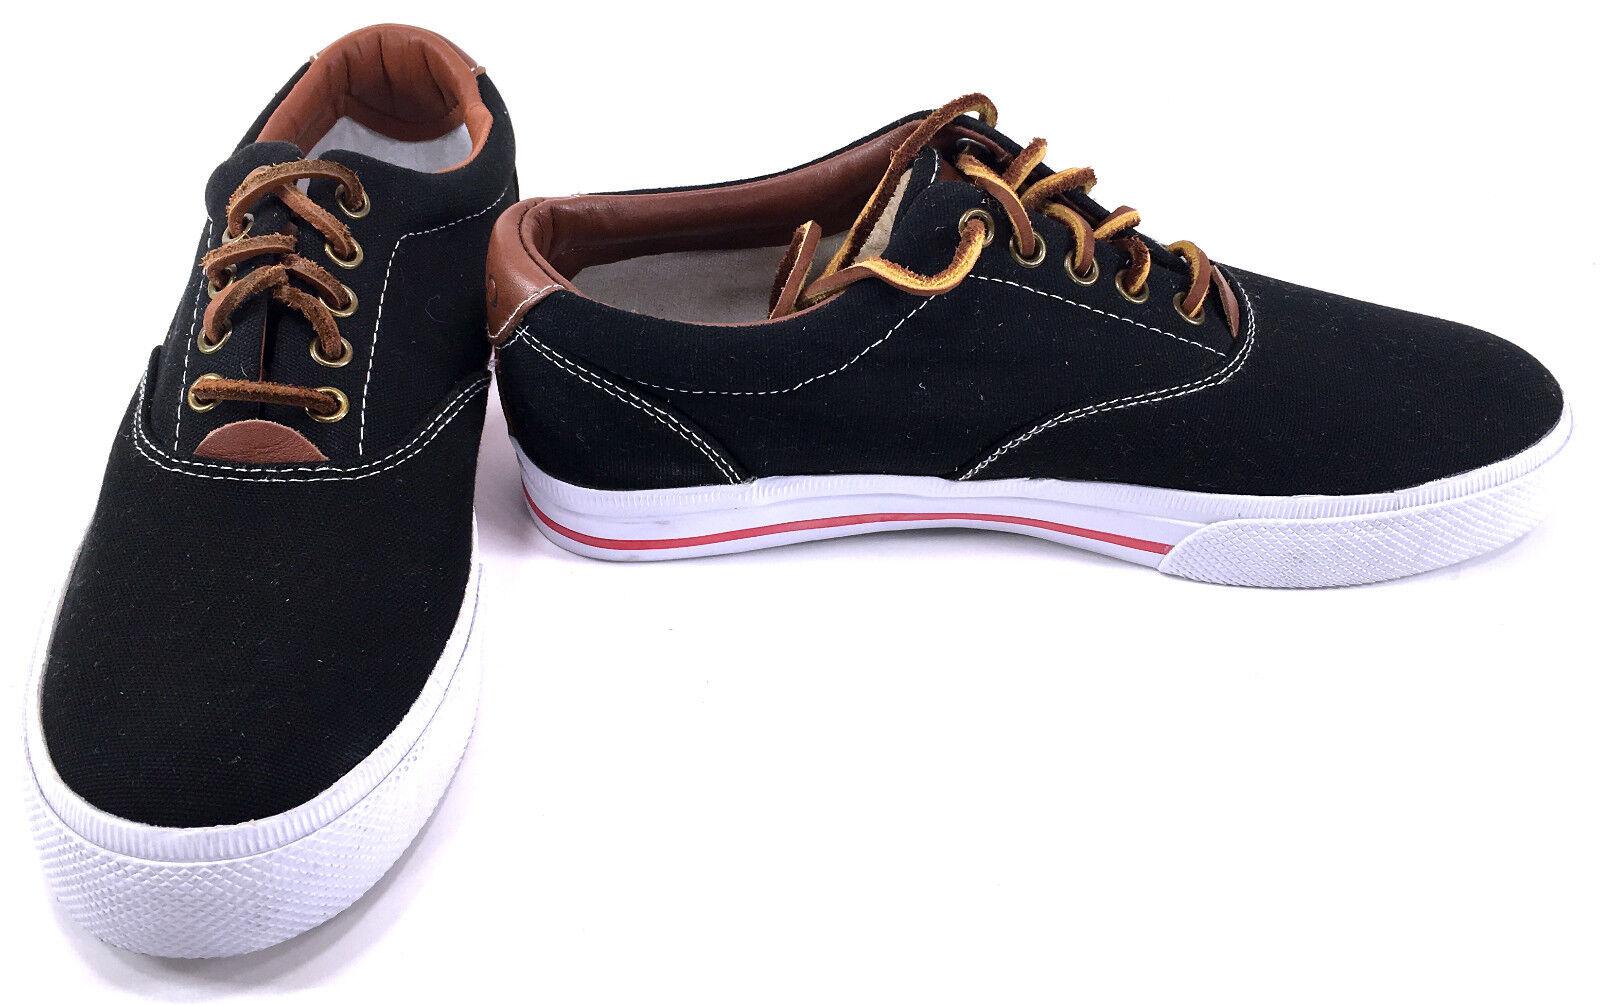 Polo Ralph Lauren shoes Vaughn Athletic Canvas Black Brown Sneakers Size 8.5